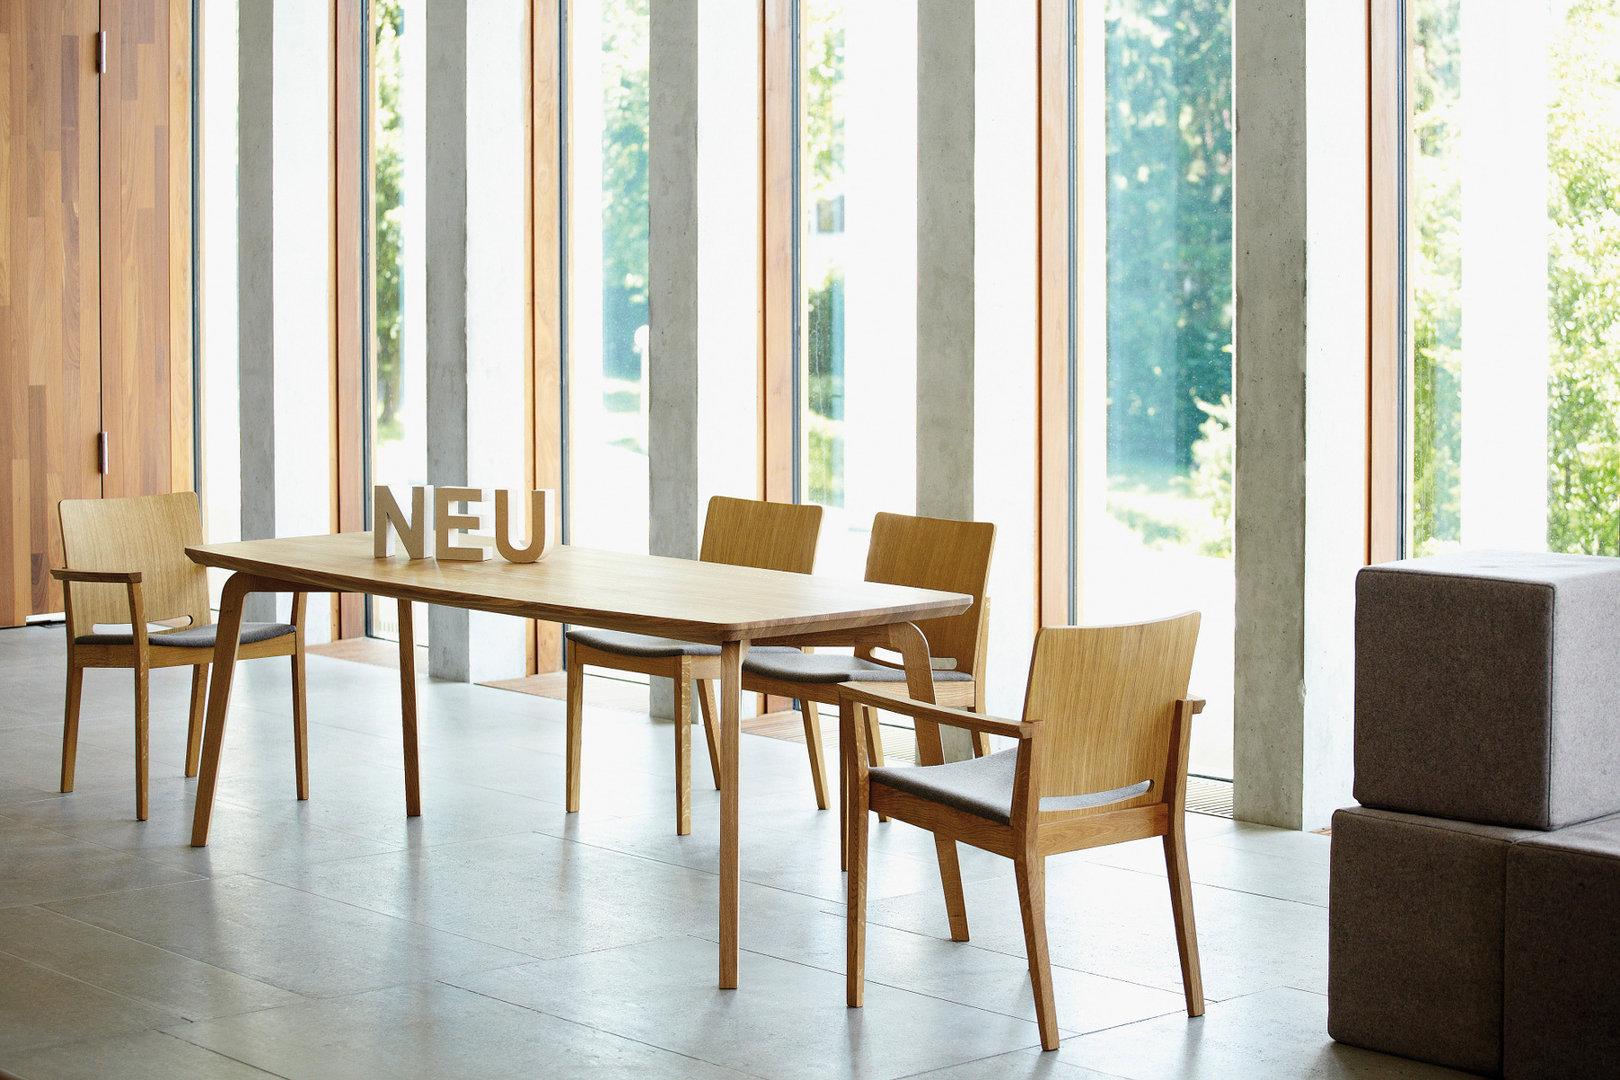 jan kurtz dweller tisch esstisch teakwoodstore24. Black Bedroom Furniture Sets. Home Design Ideas